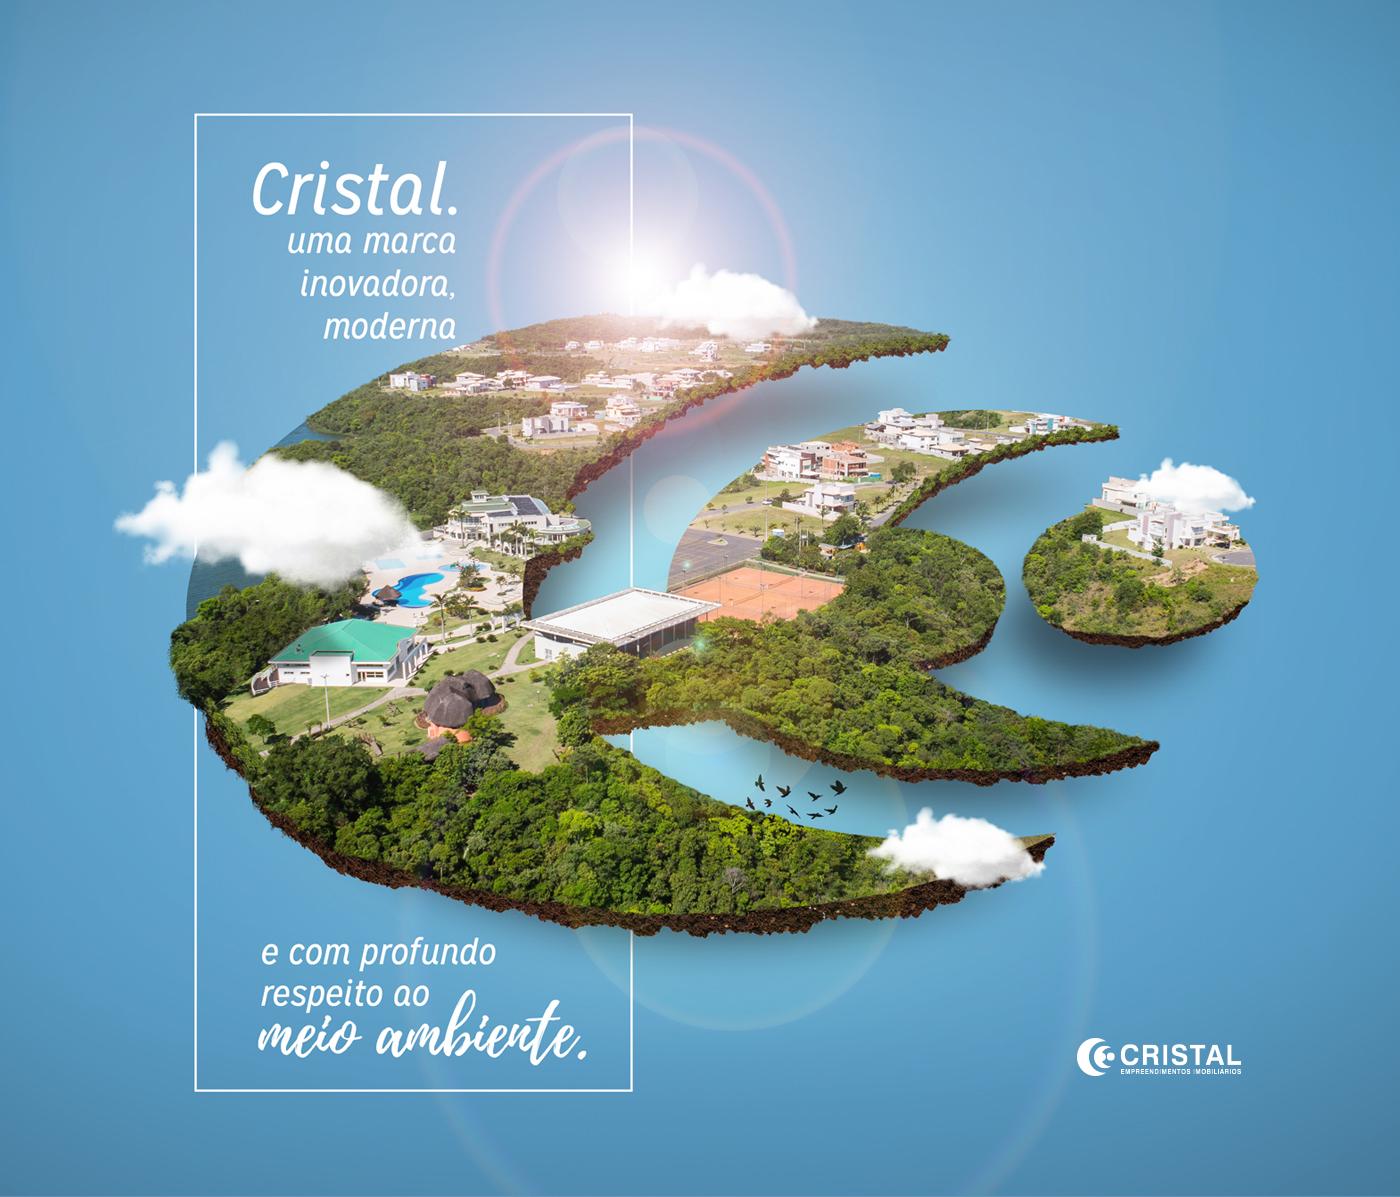 design social media Isometric criation land graphic design  rogers alberto Mboitatá cristal empreendimentos